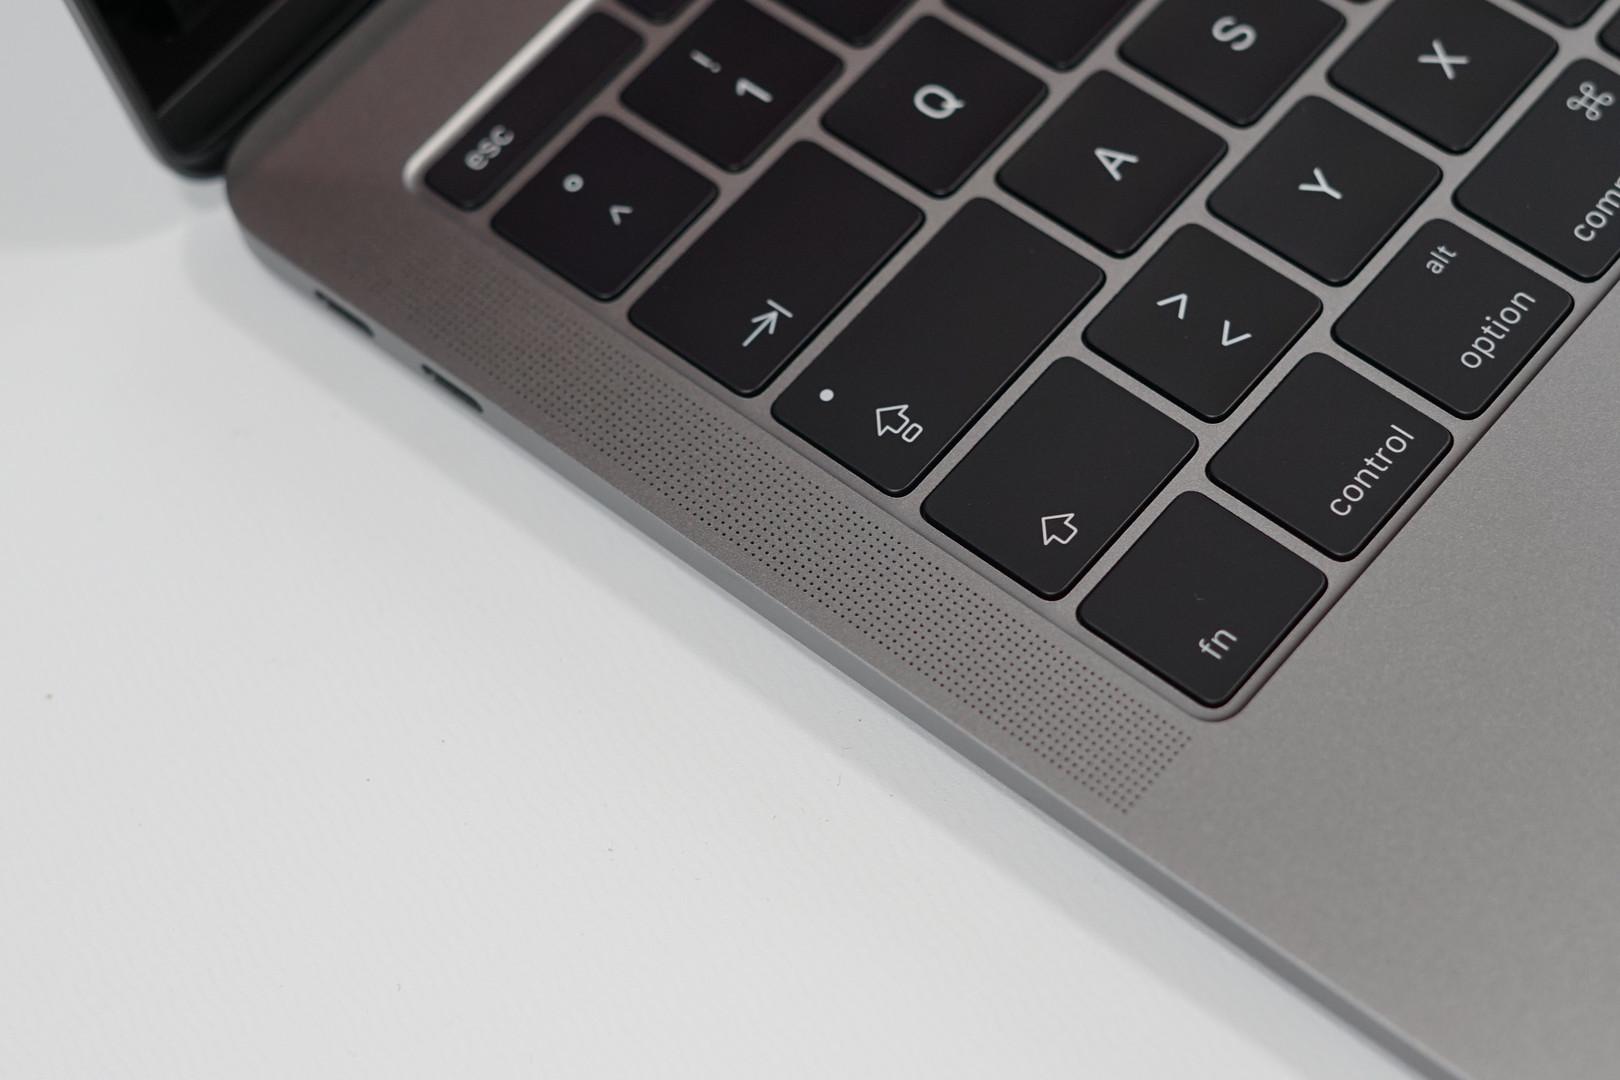 Adobe Premiere Pro выводит динамики MacBook Pro из строя - фото 1 | Сервисный центр Total Apple